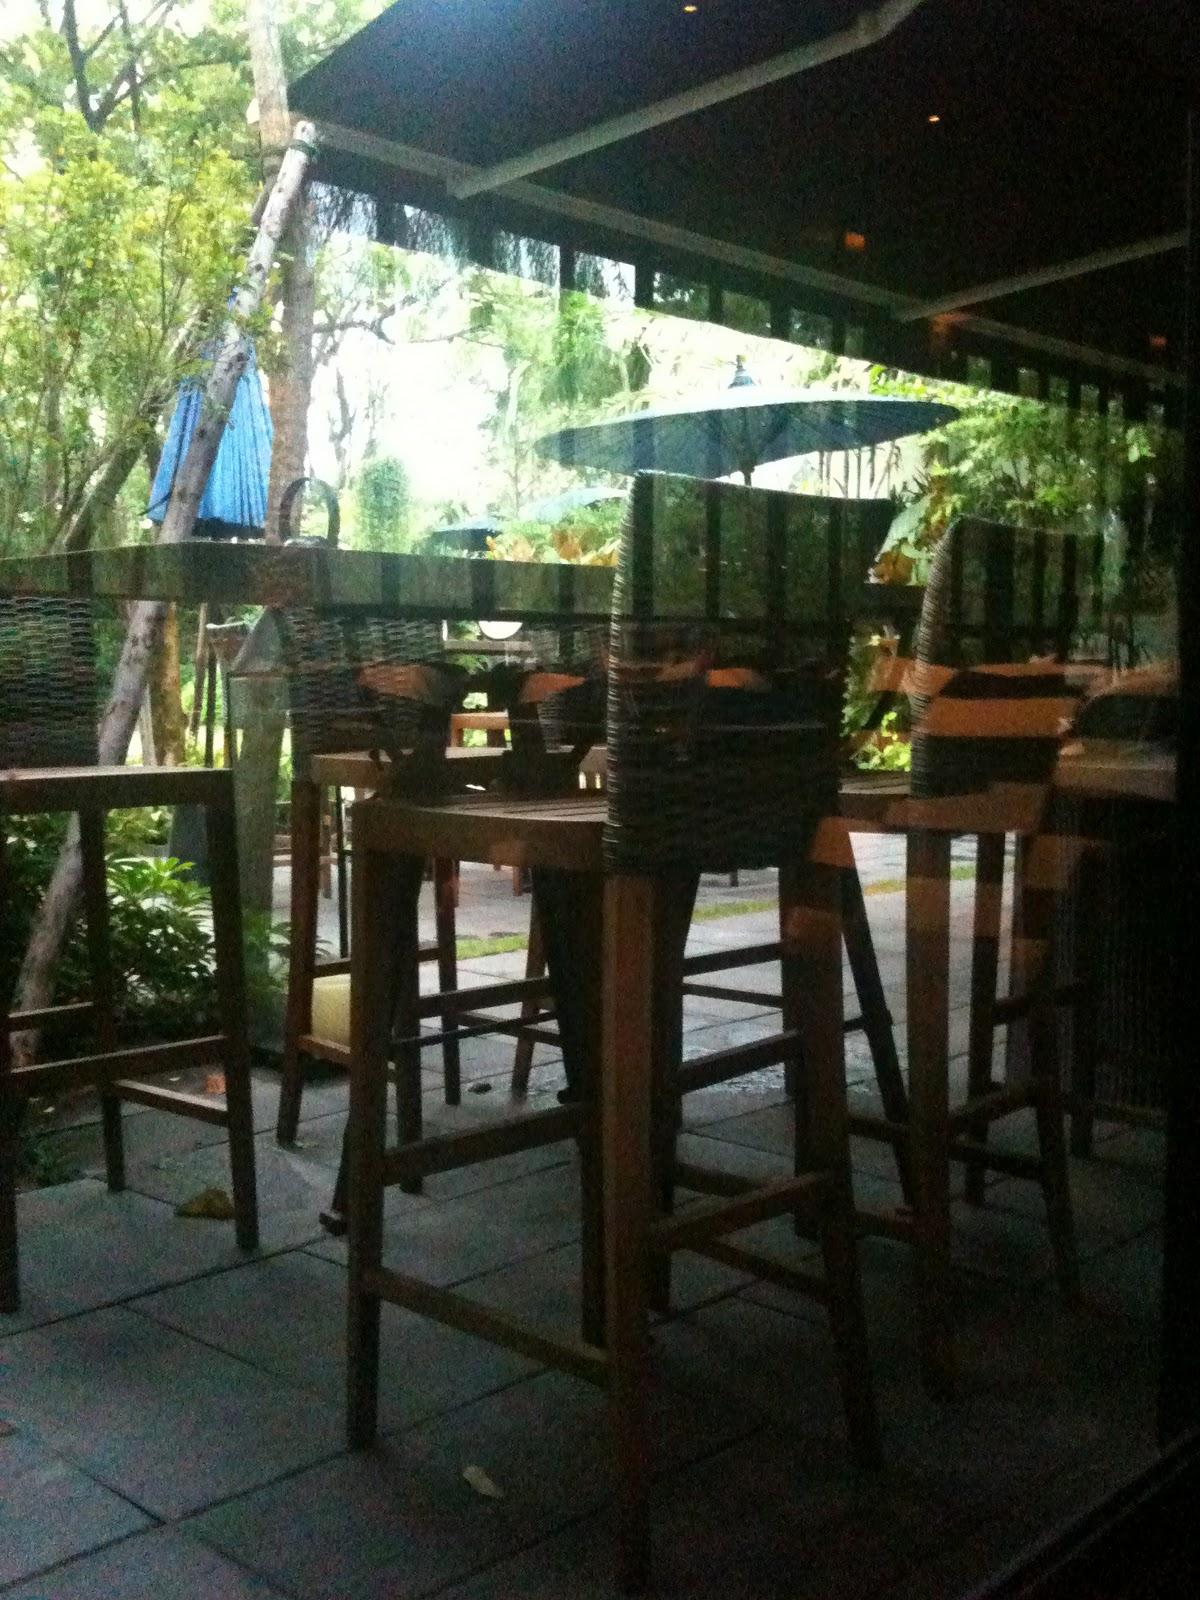 nunthanon t happy time at 99 rest backyard cafe u0027